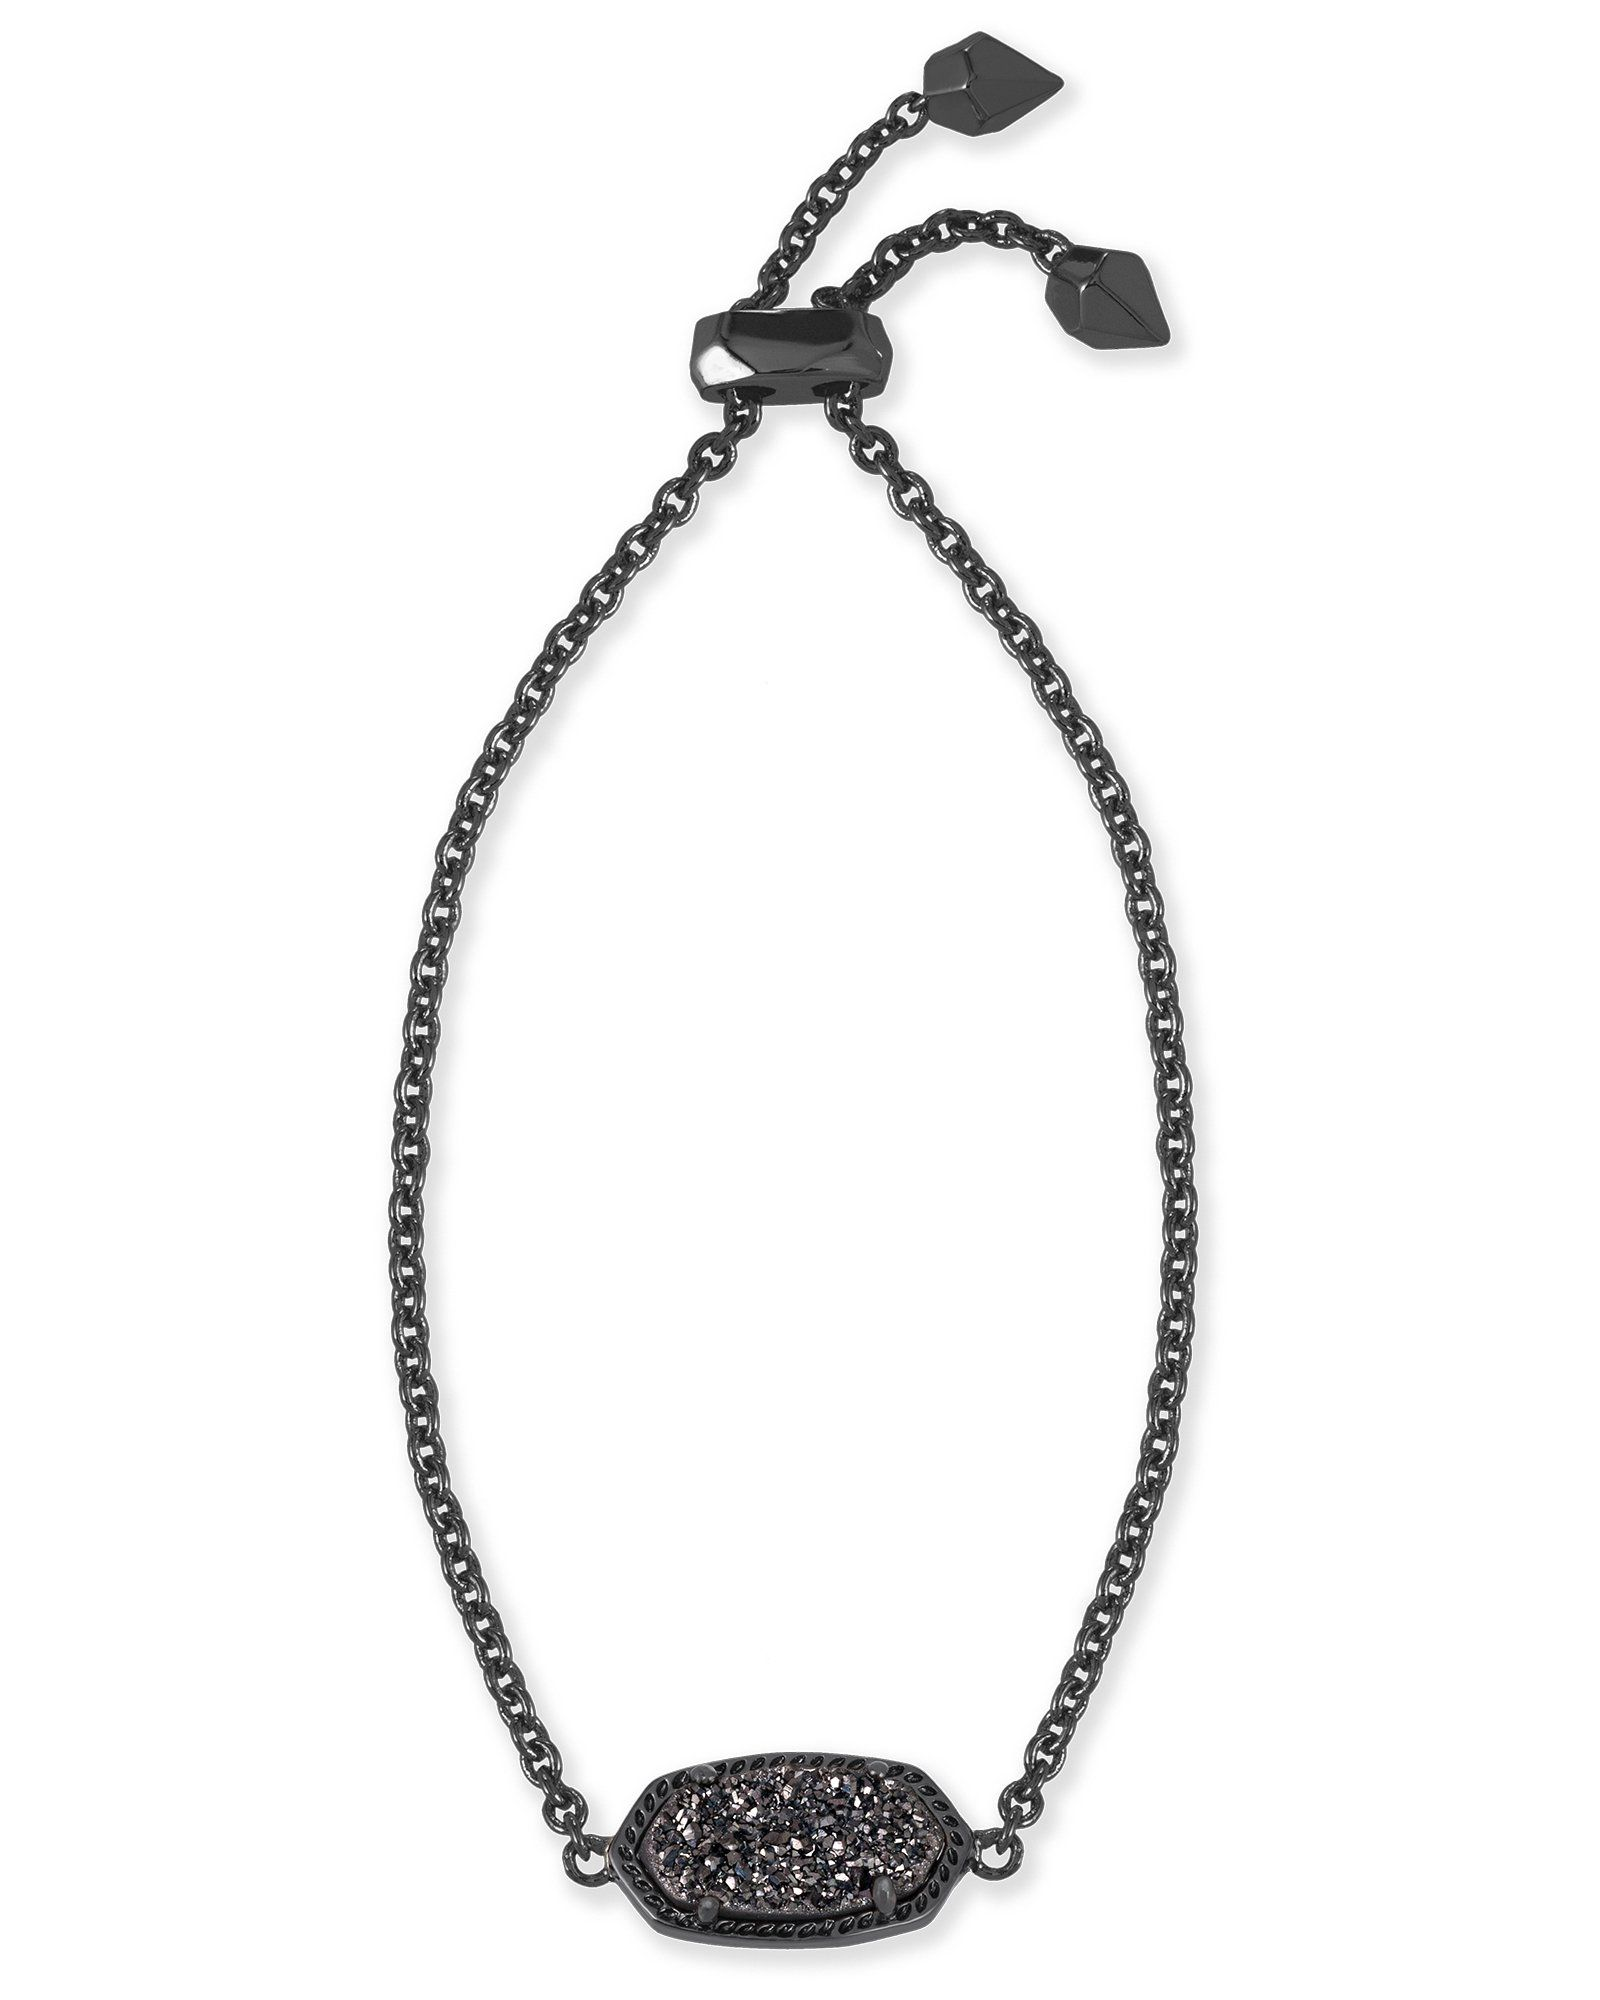 Kendra scott elaina black drusy black adjustable bolo bracelet